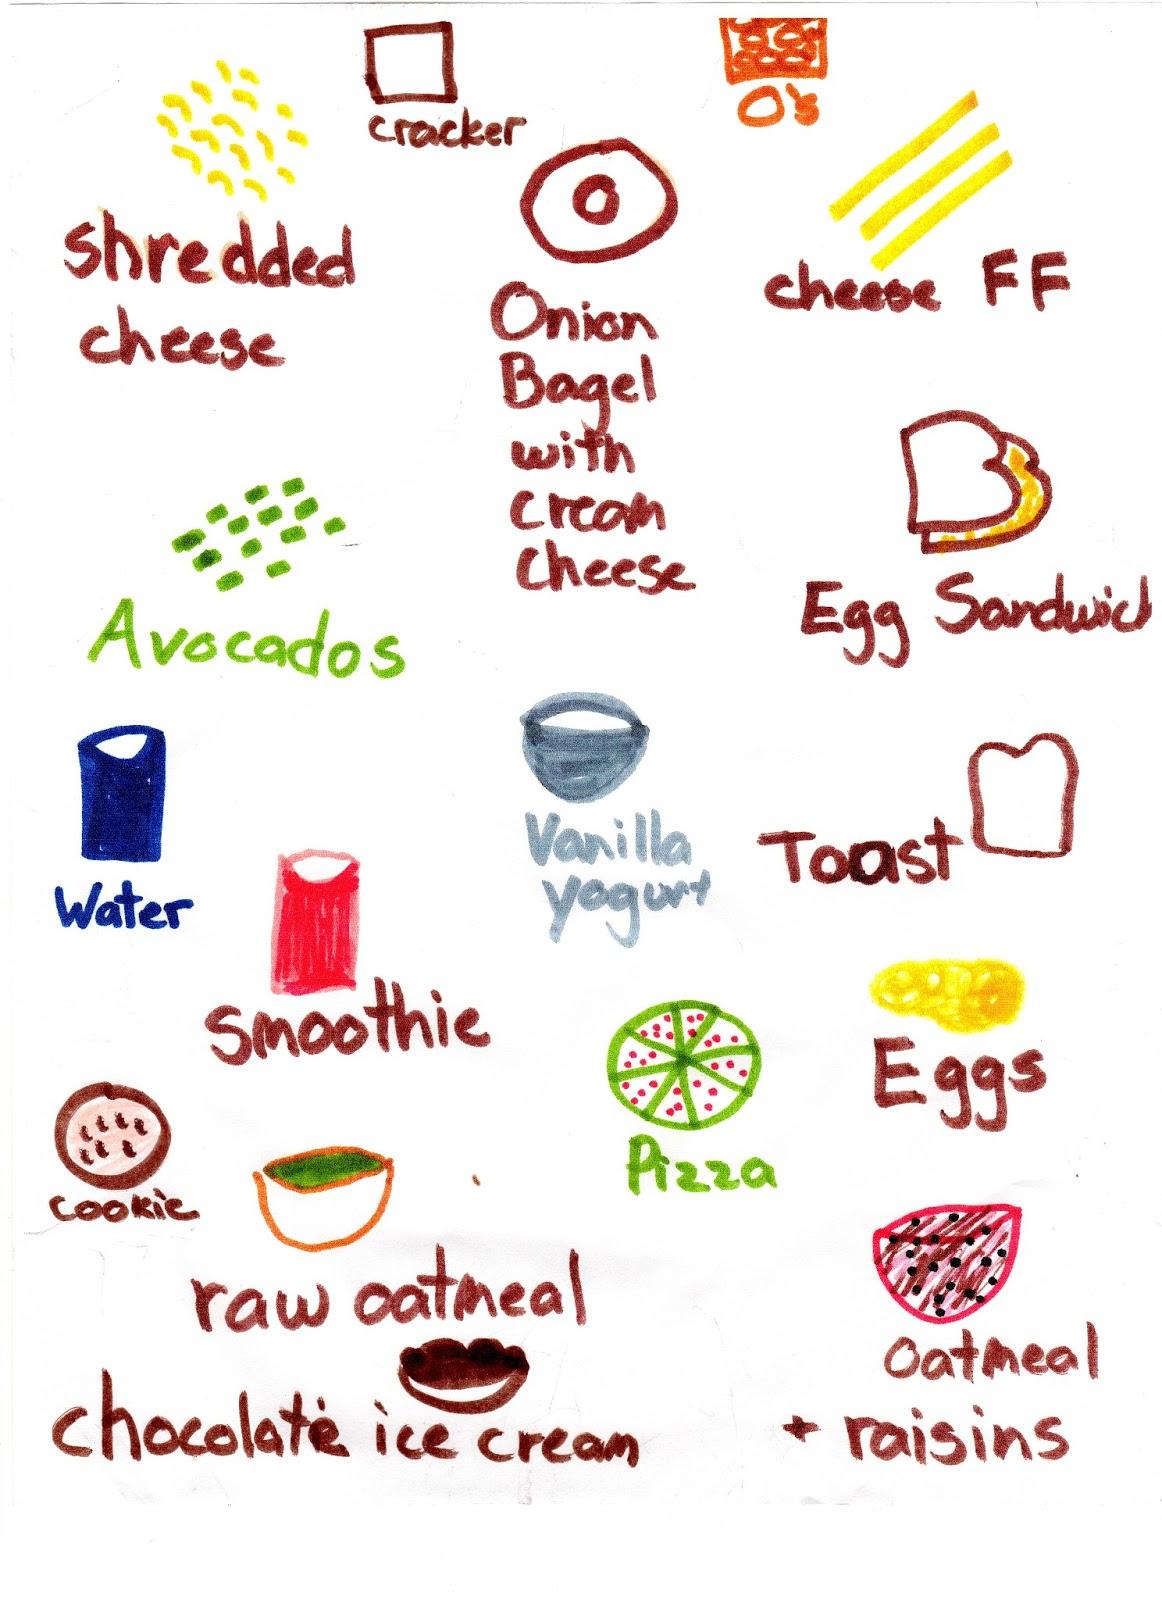 Joyful Abundance Kanoa S Favorite Food Choices